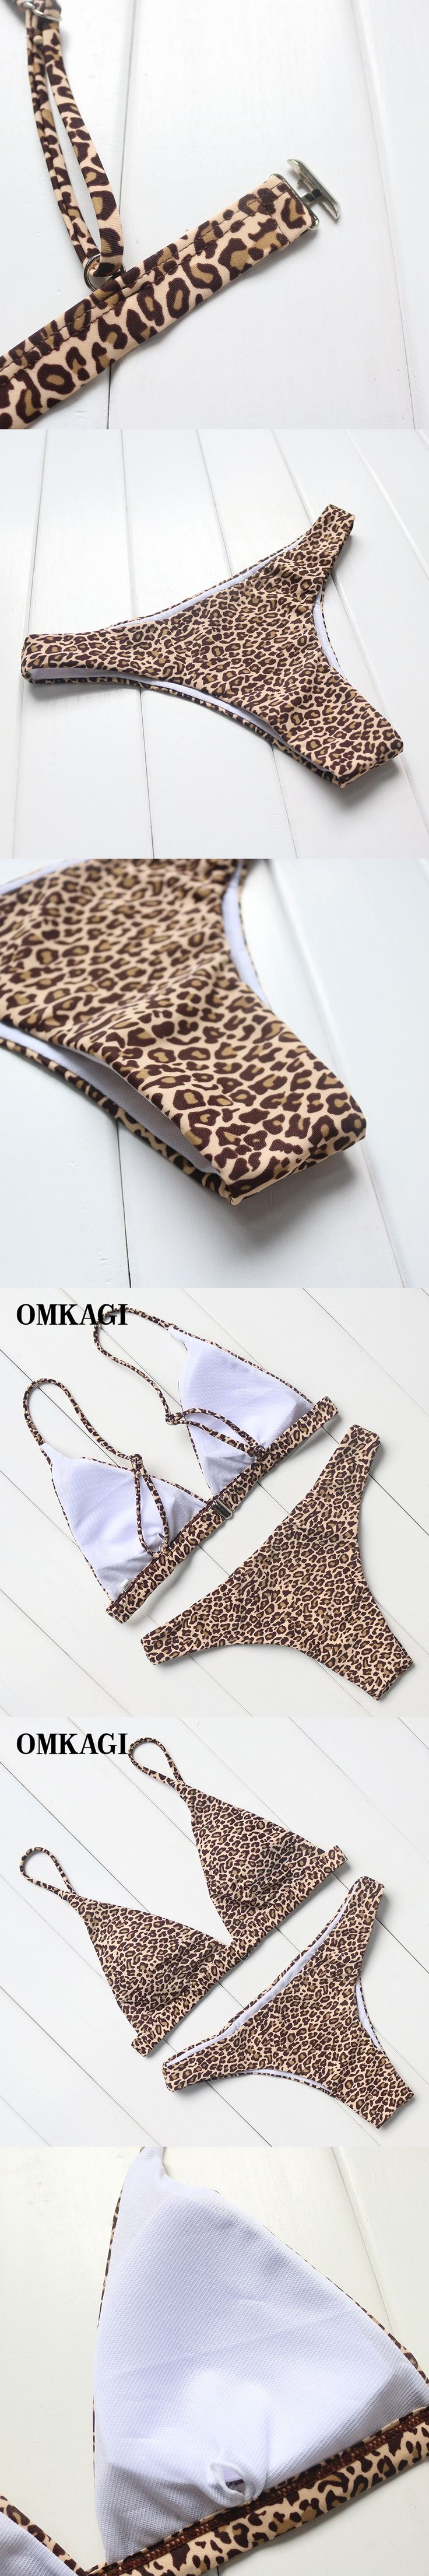 OMKAGI Brand Leopard Bikinis Women Sexy Bikinis 2017 Push Up Padded Brazilian Swimsuits Summer Bathing Suits Beach Wear Swimwear